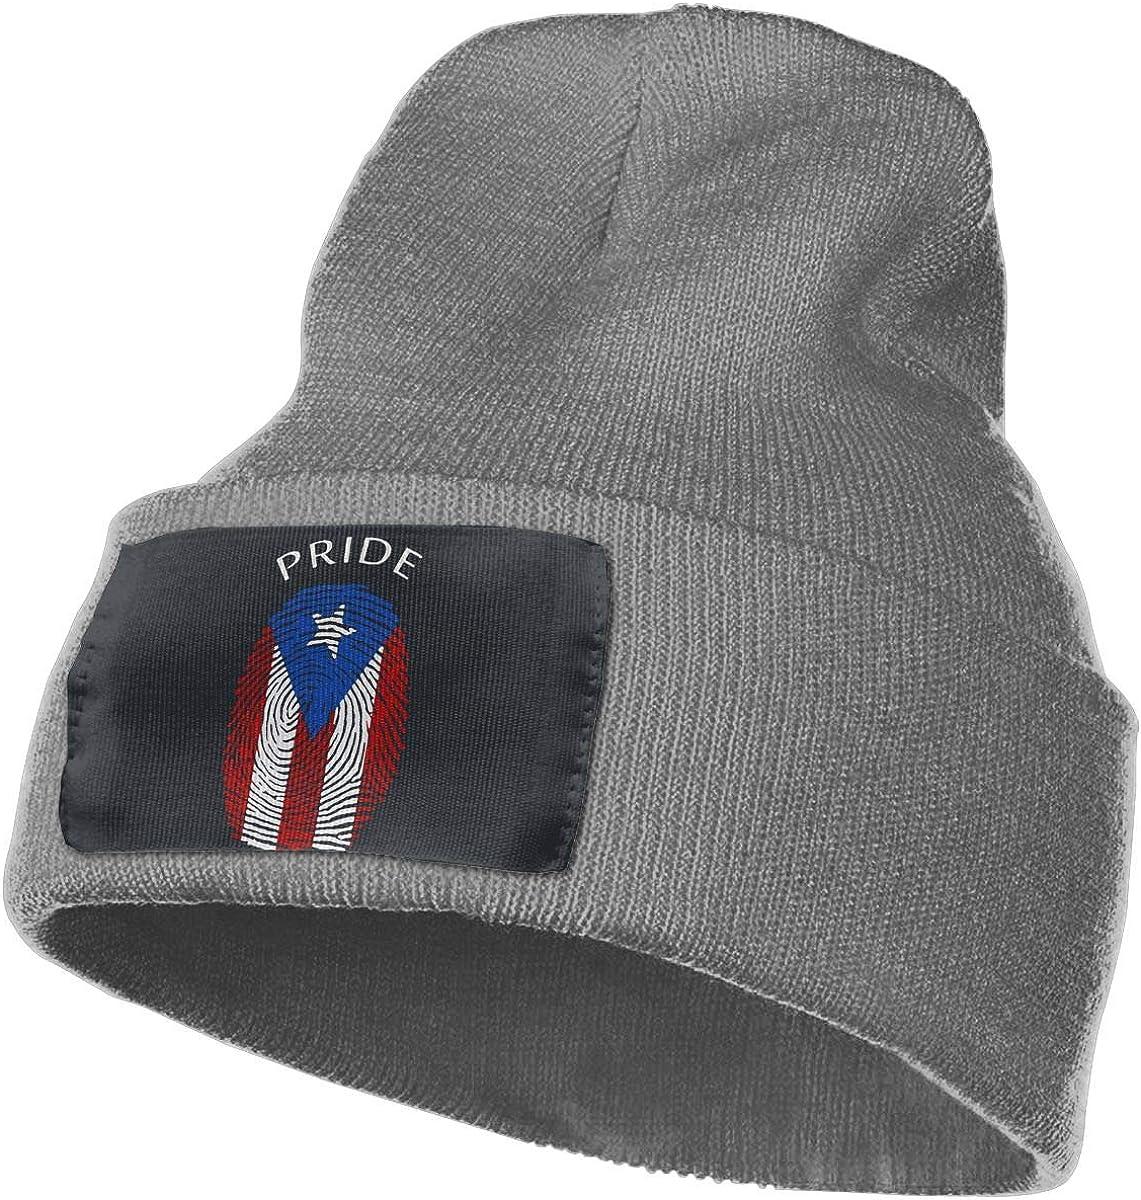 MaoXCatt Puerto Rican Pride Unisex Winter Comfortable Beanie Cap